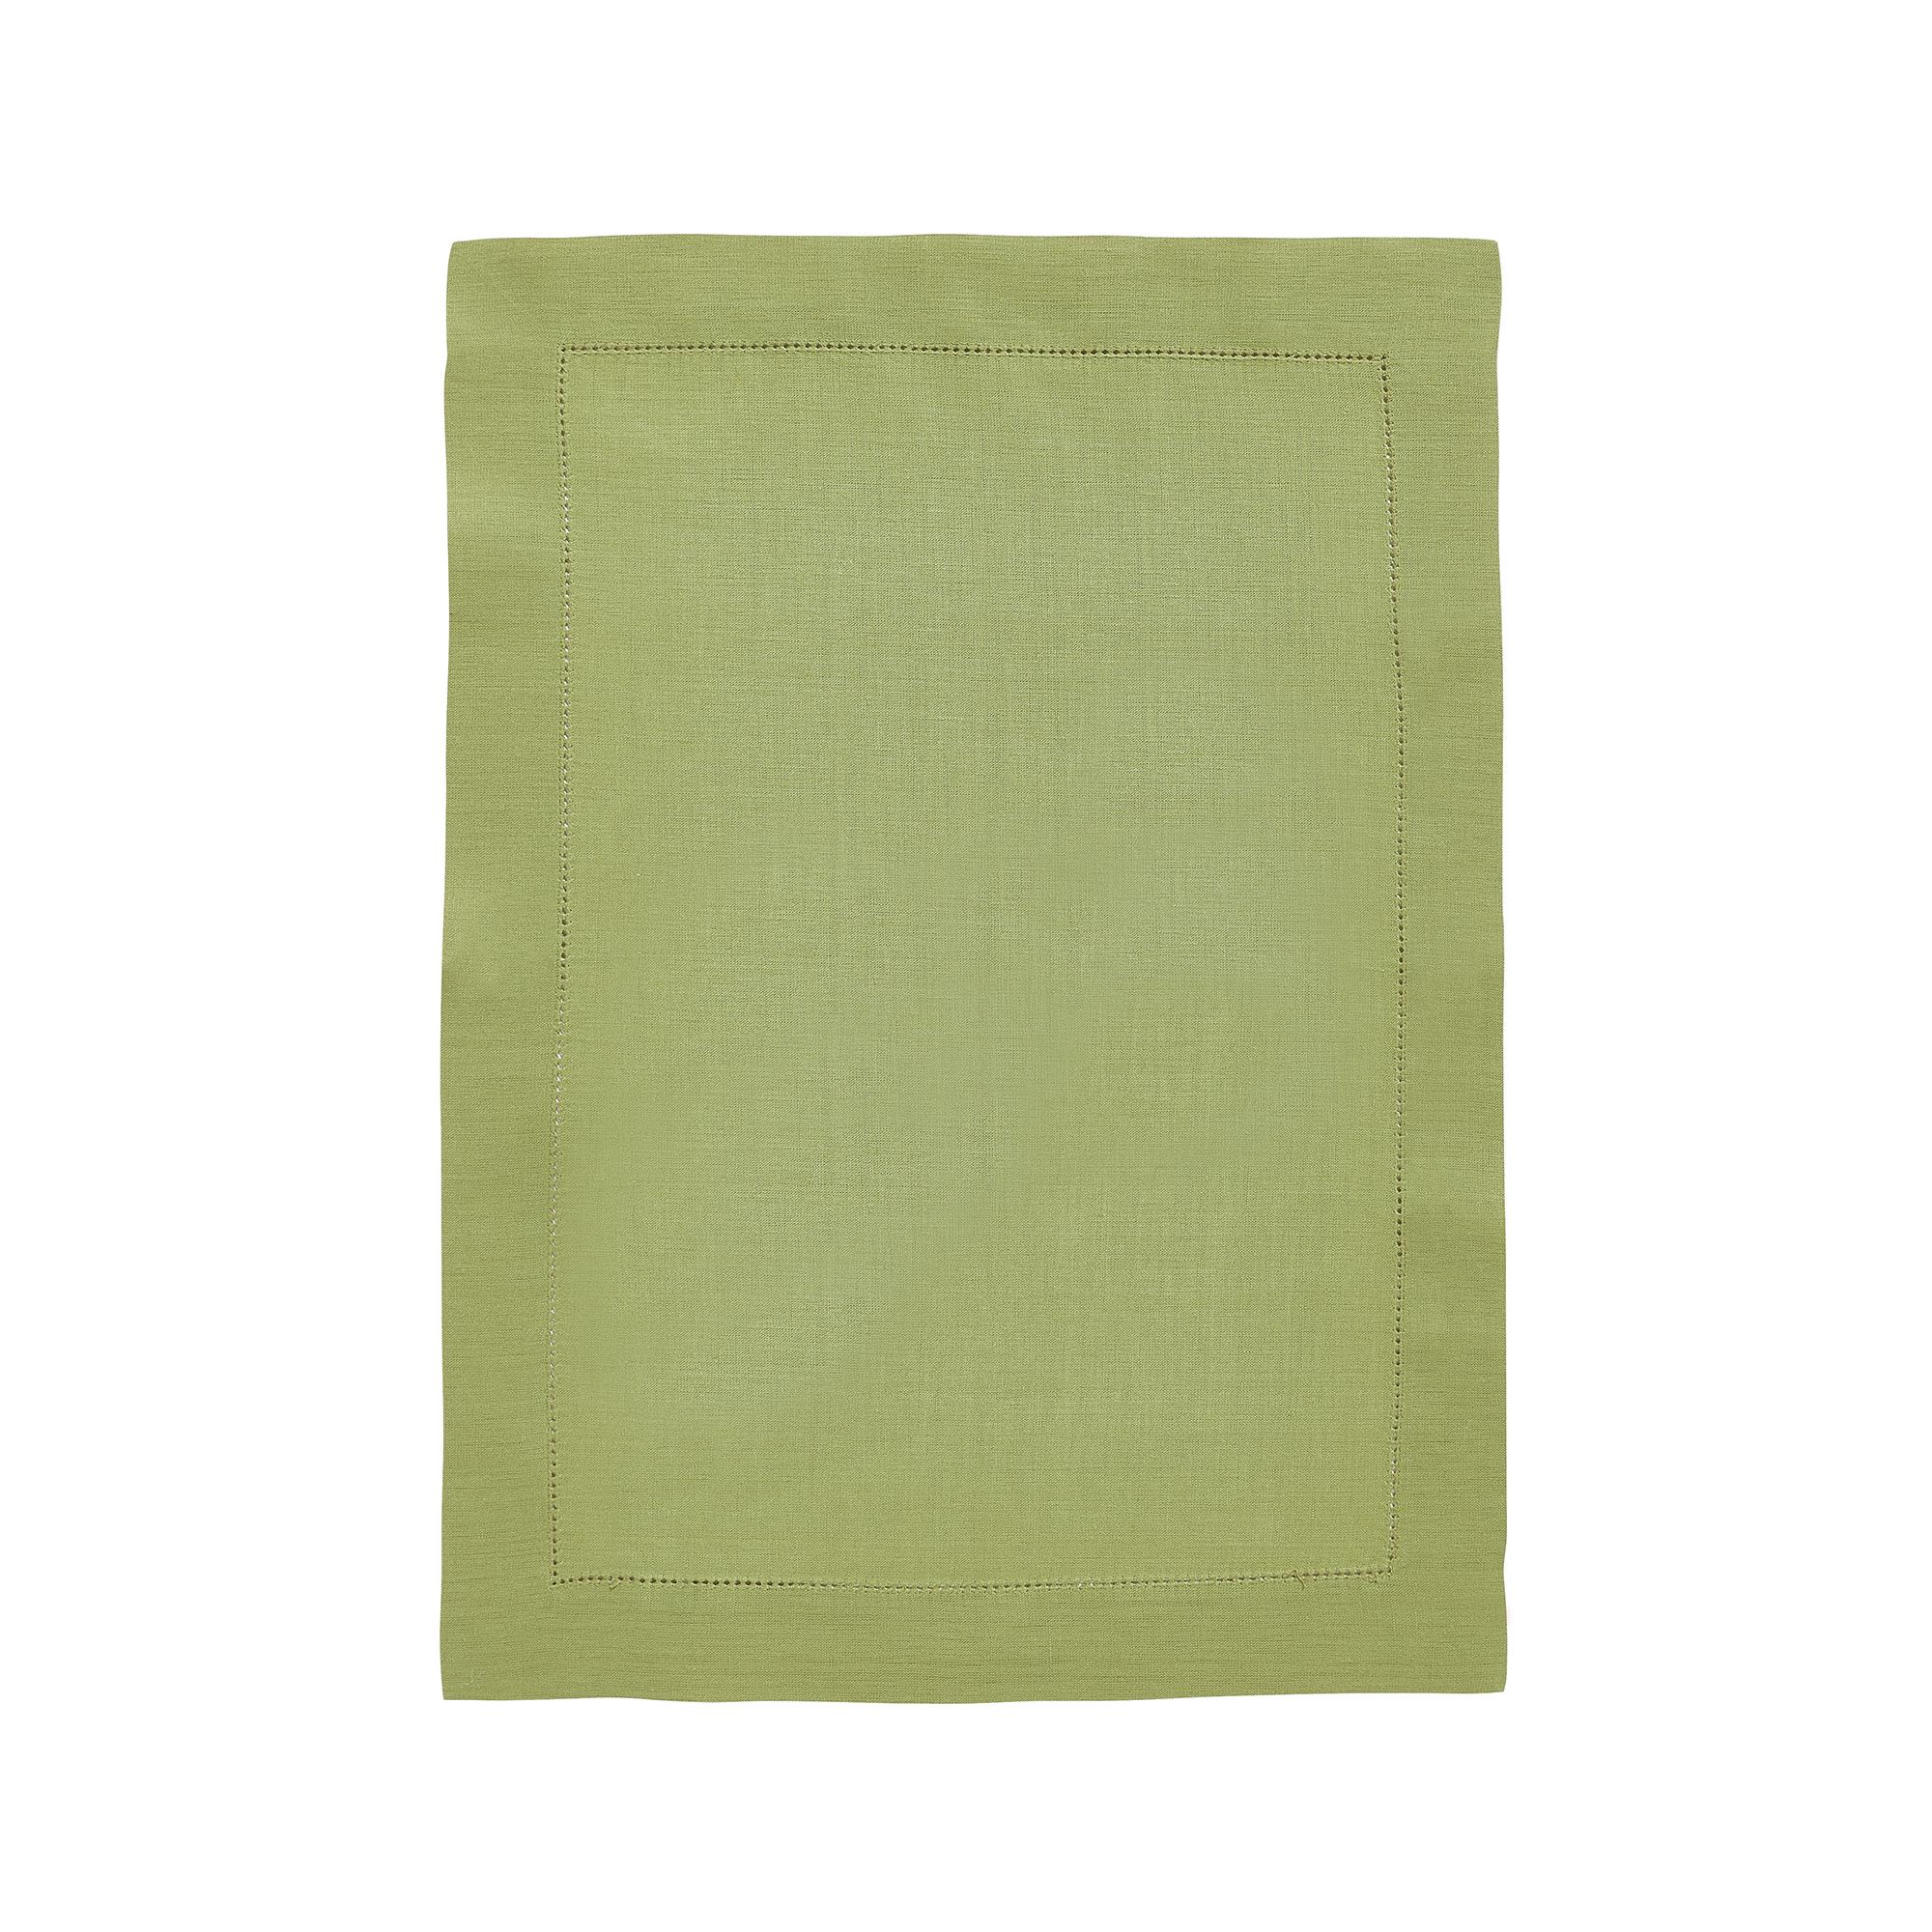 Set de table en lin vert platane 37x50